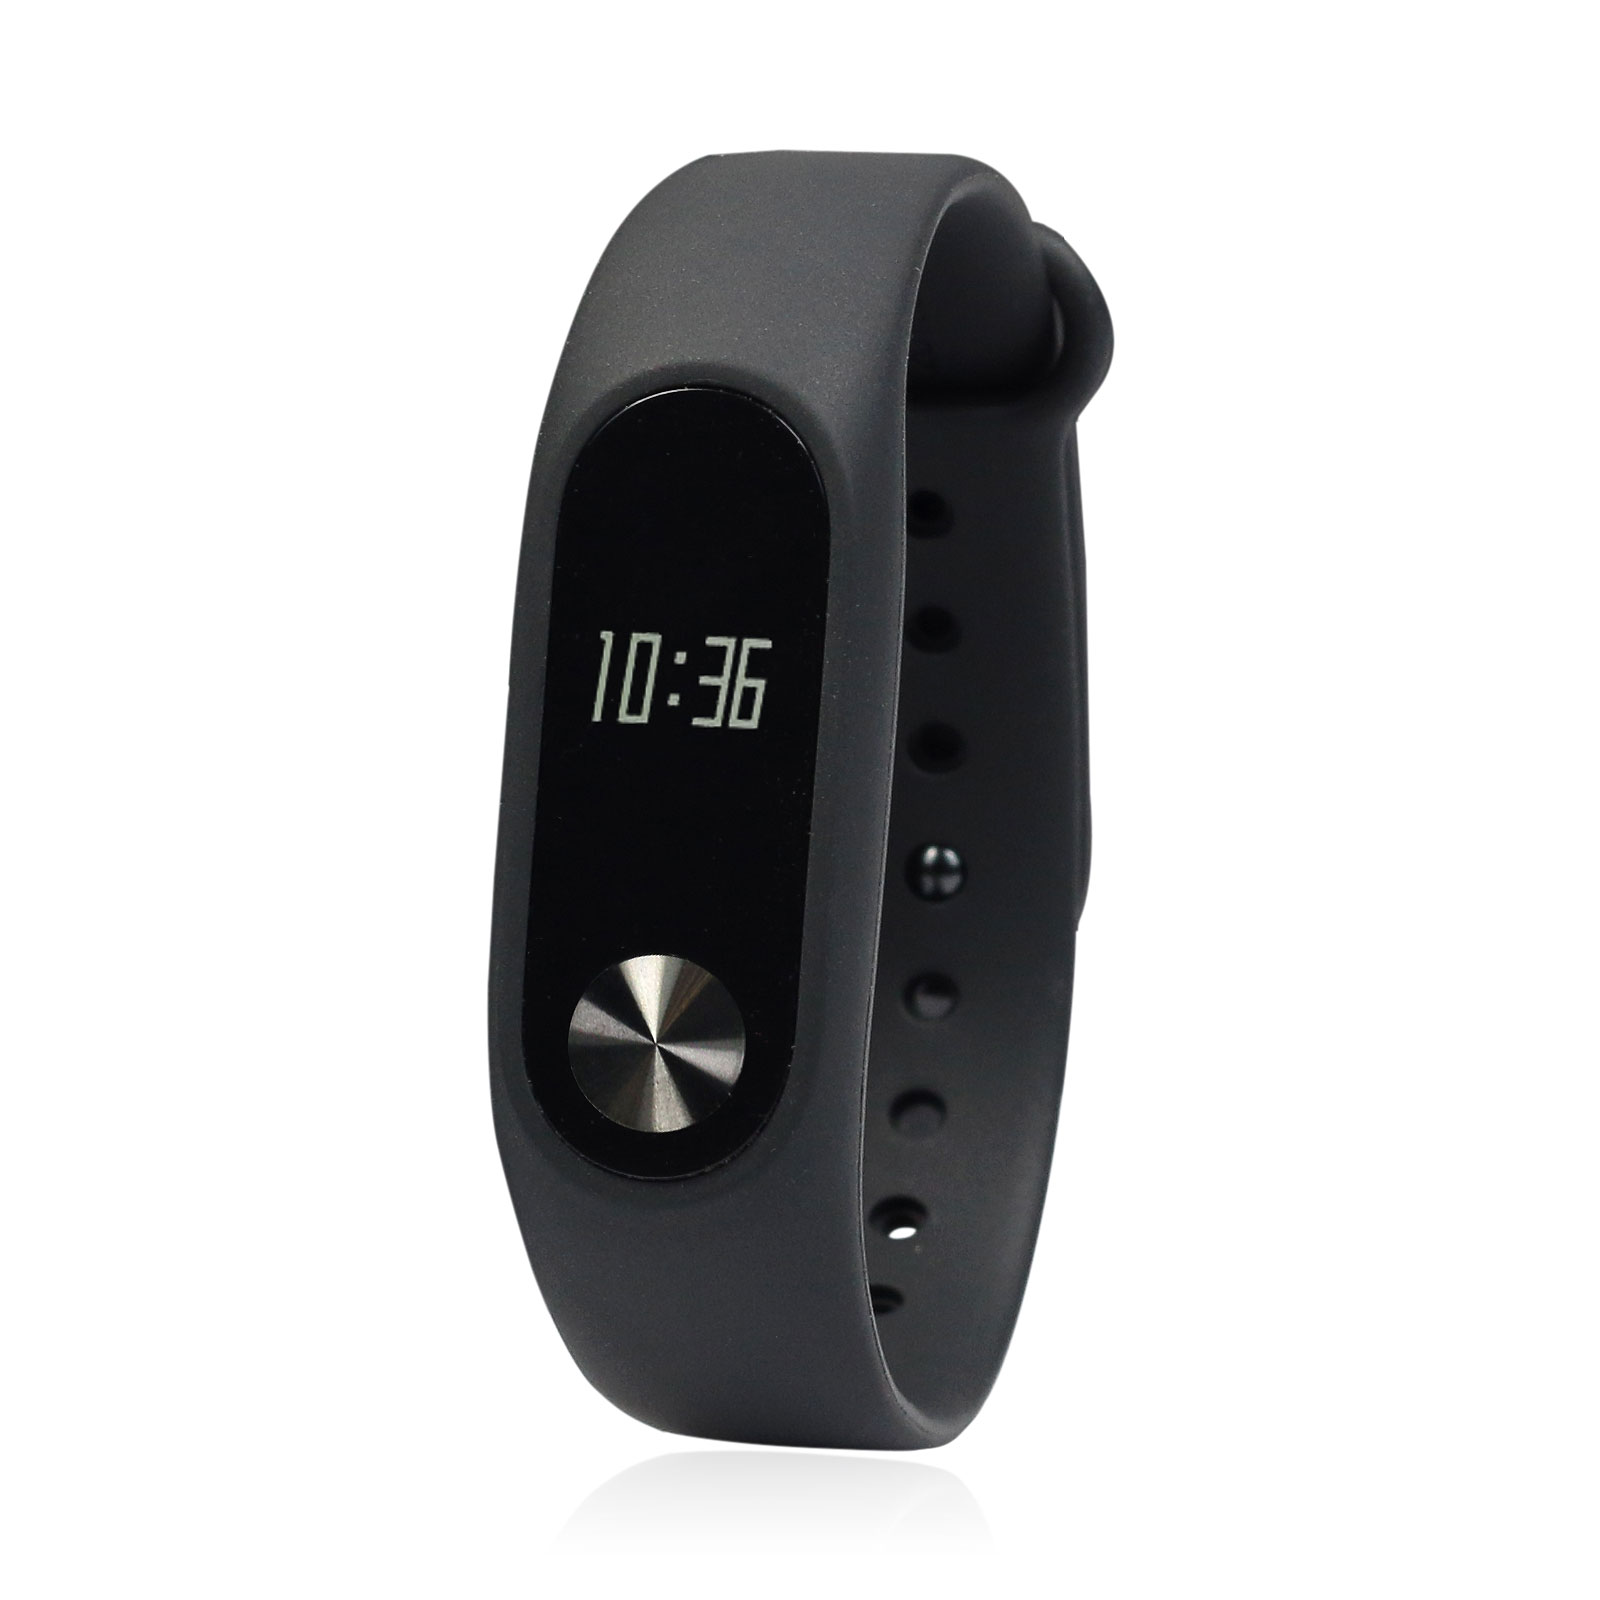 Smartwatches Wearables Satking Gmbh Xiaomi Mi Band 2 Original Black Free Screen Guard Pcs